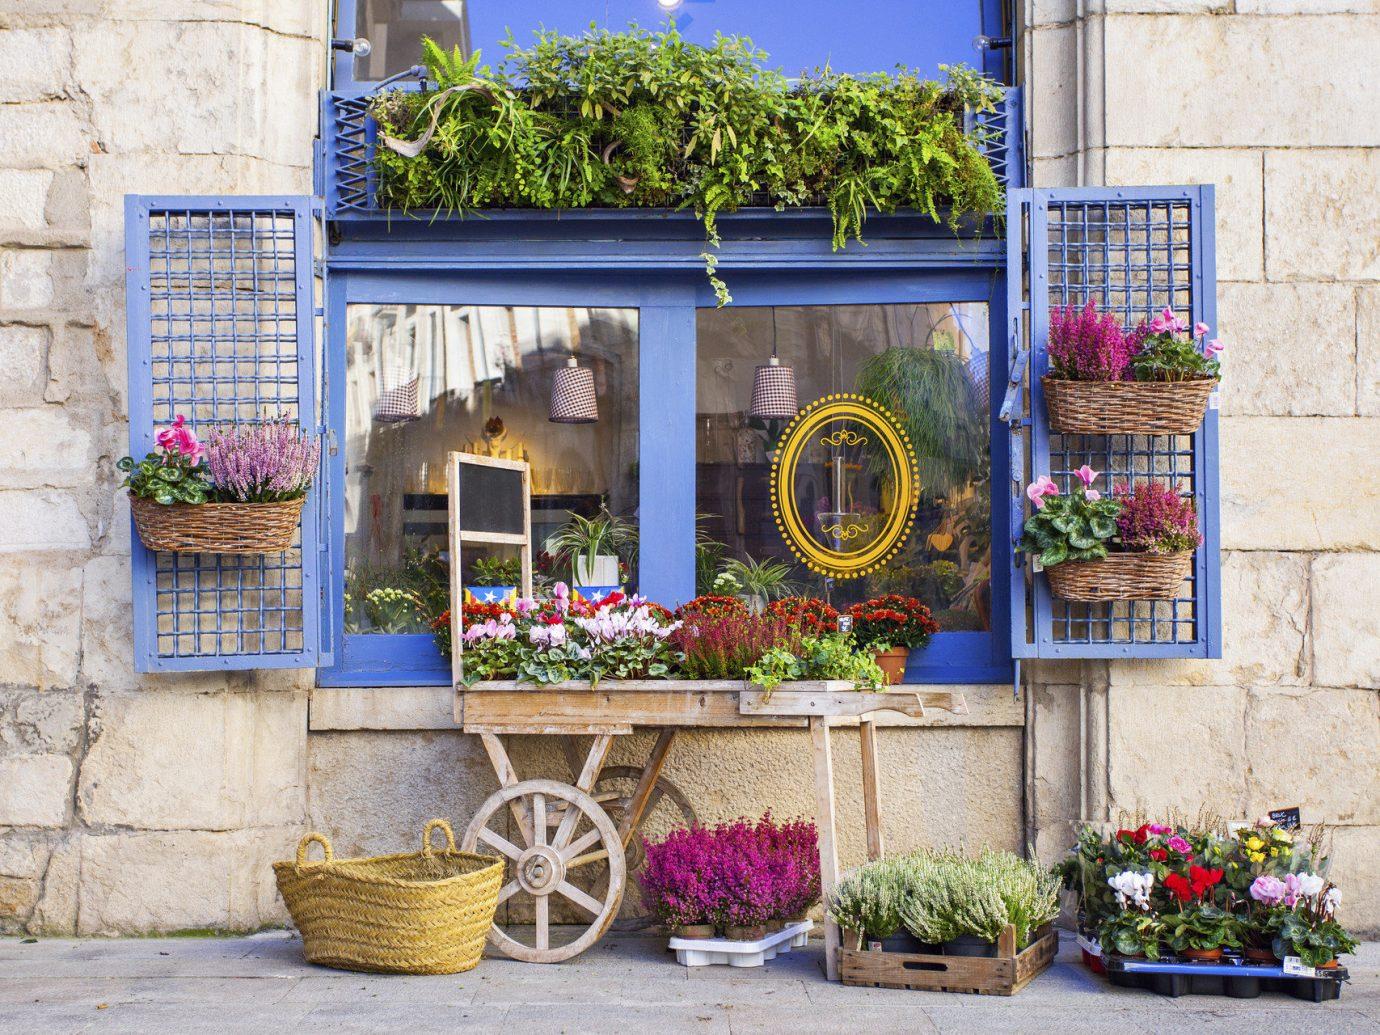 Romance Travel Tips Trip Ideas building outdoor flower floristry Balcony facade home Courtyard Garden yard window stone